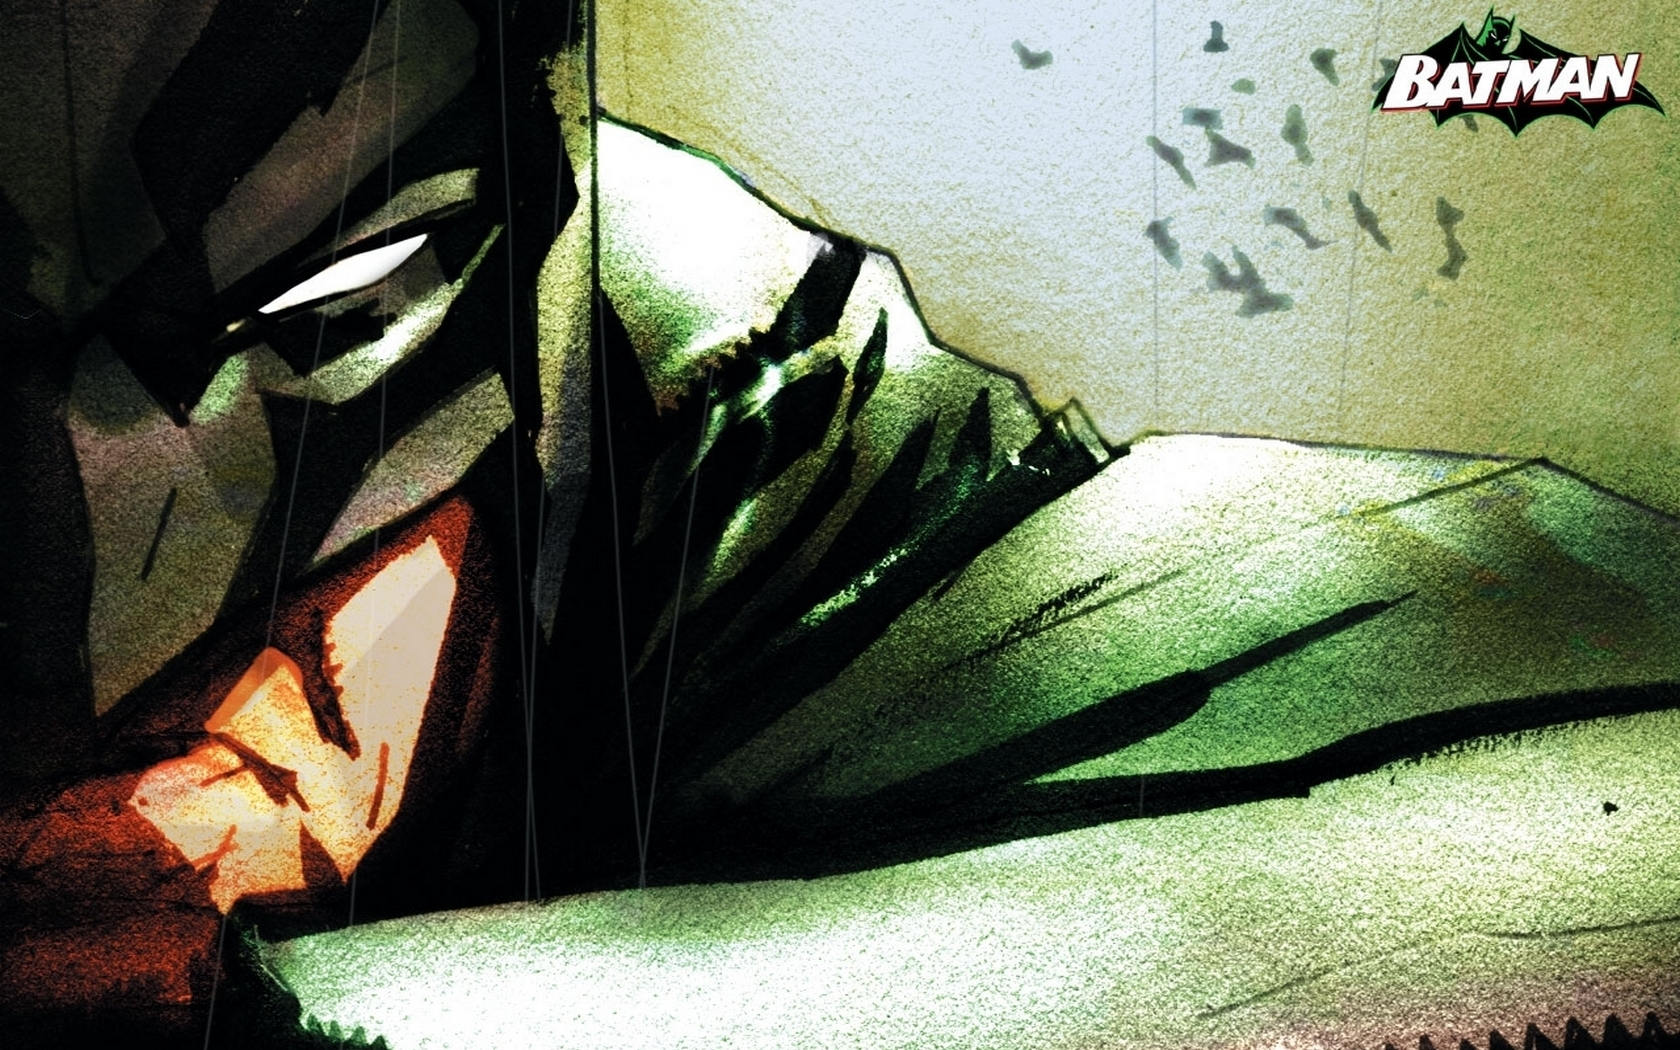 Batman Wallpapers, Pictures, Photo